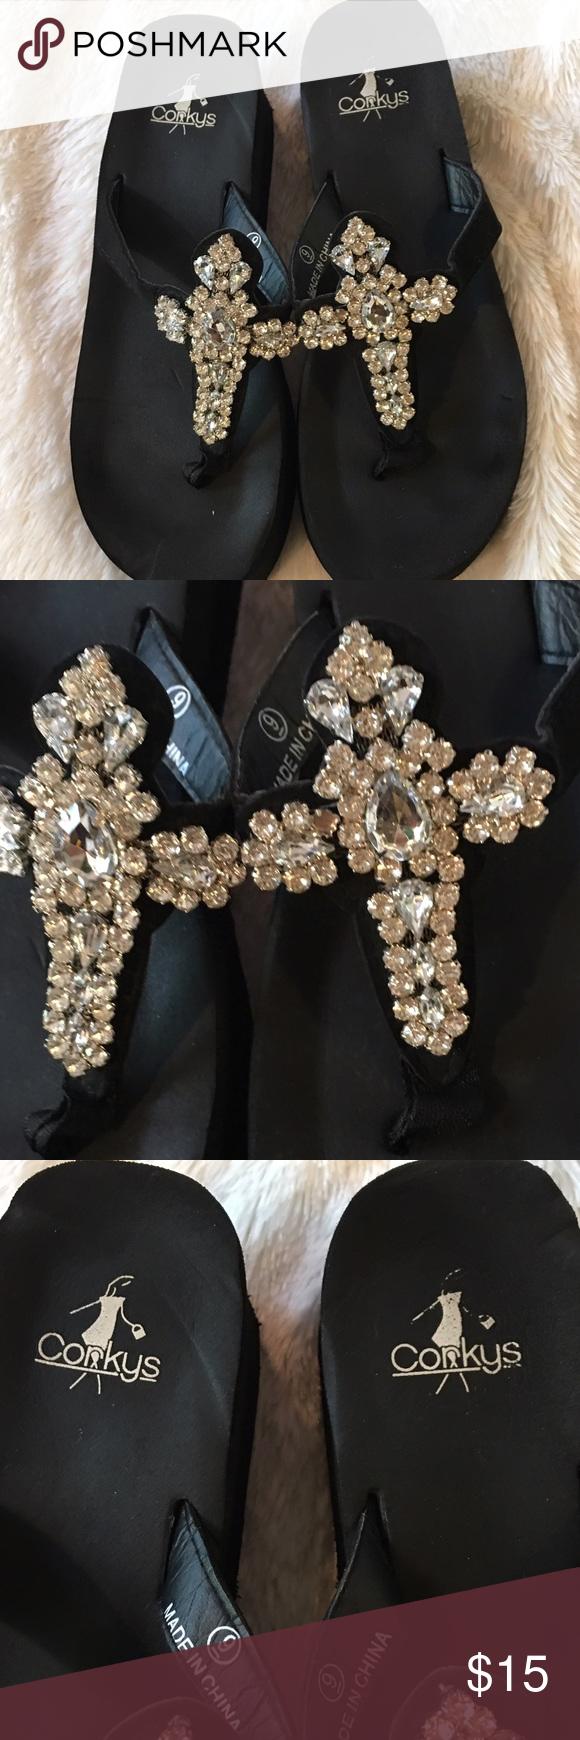 46b77eddb Corkys black rhinestone cross wedges sz 9 Corkys black rhinestone cross  wedges size 9- worn only a couple times- great condition! Corkys Shoes  Sandals